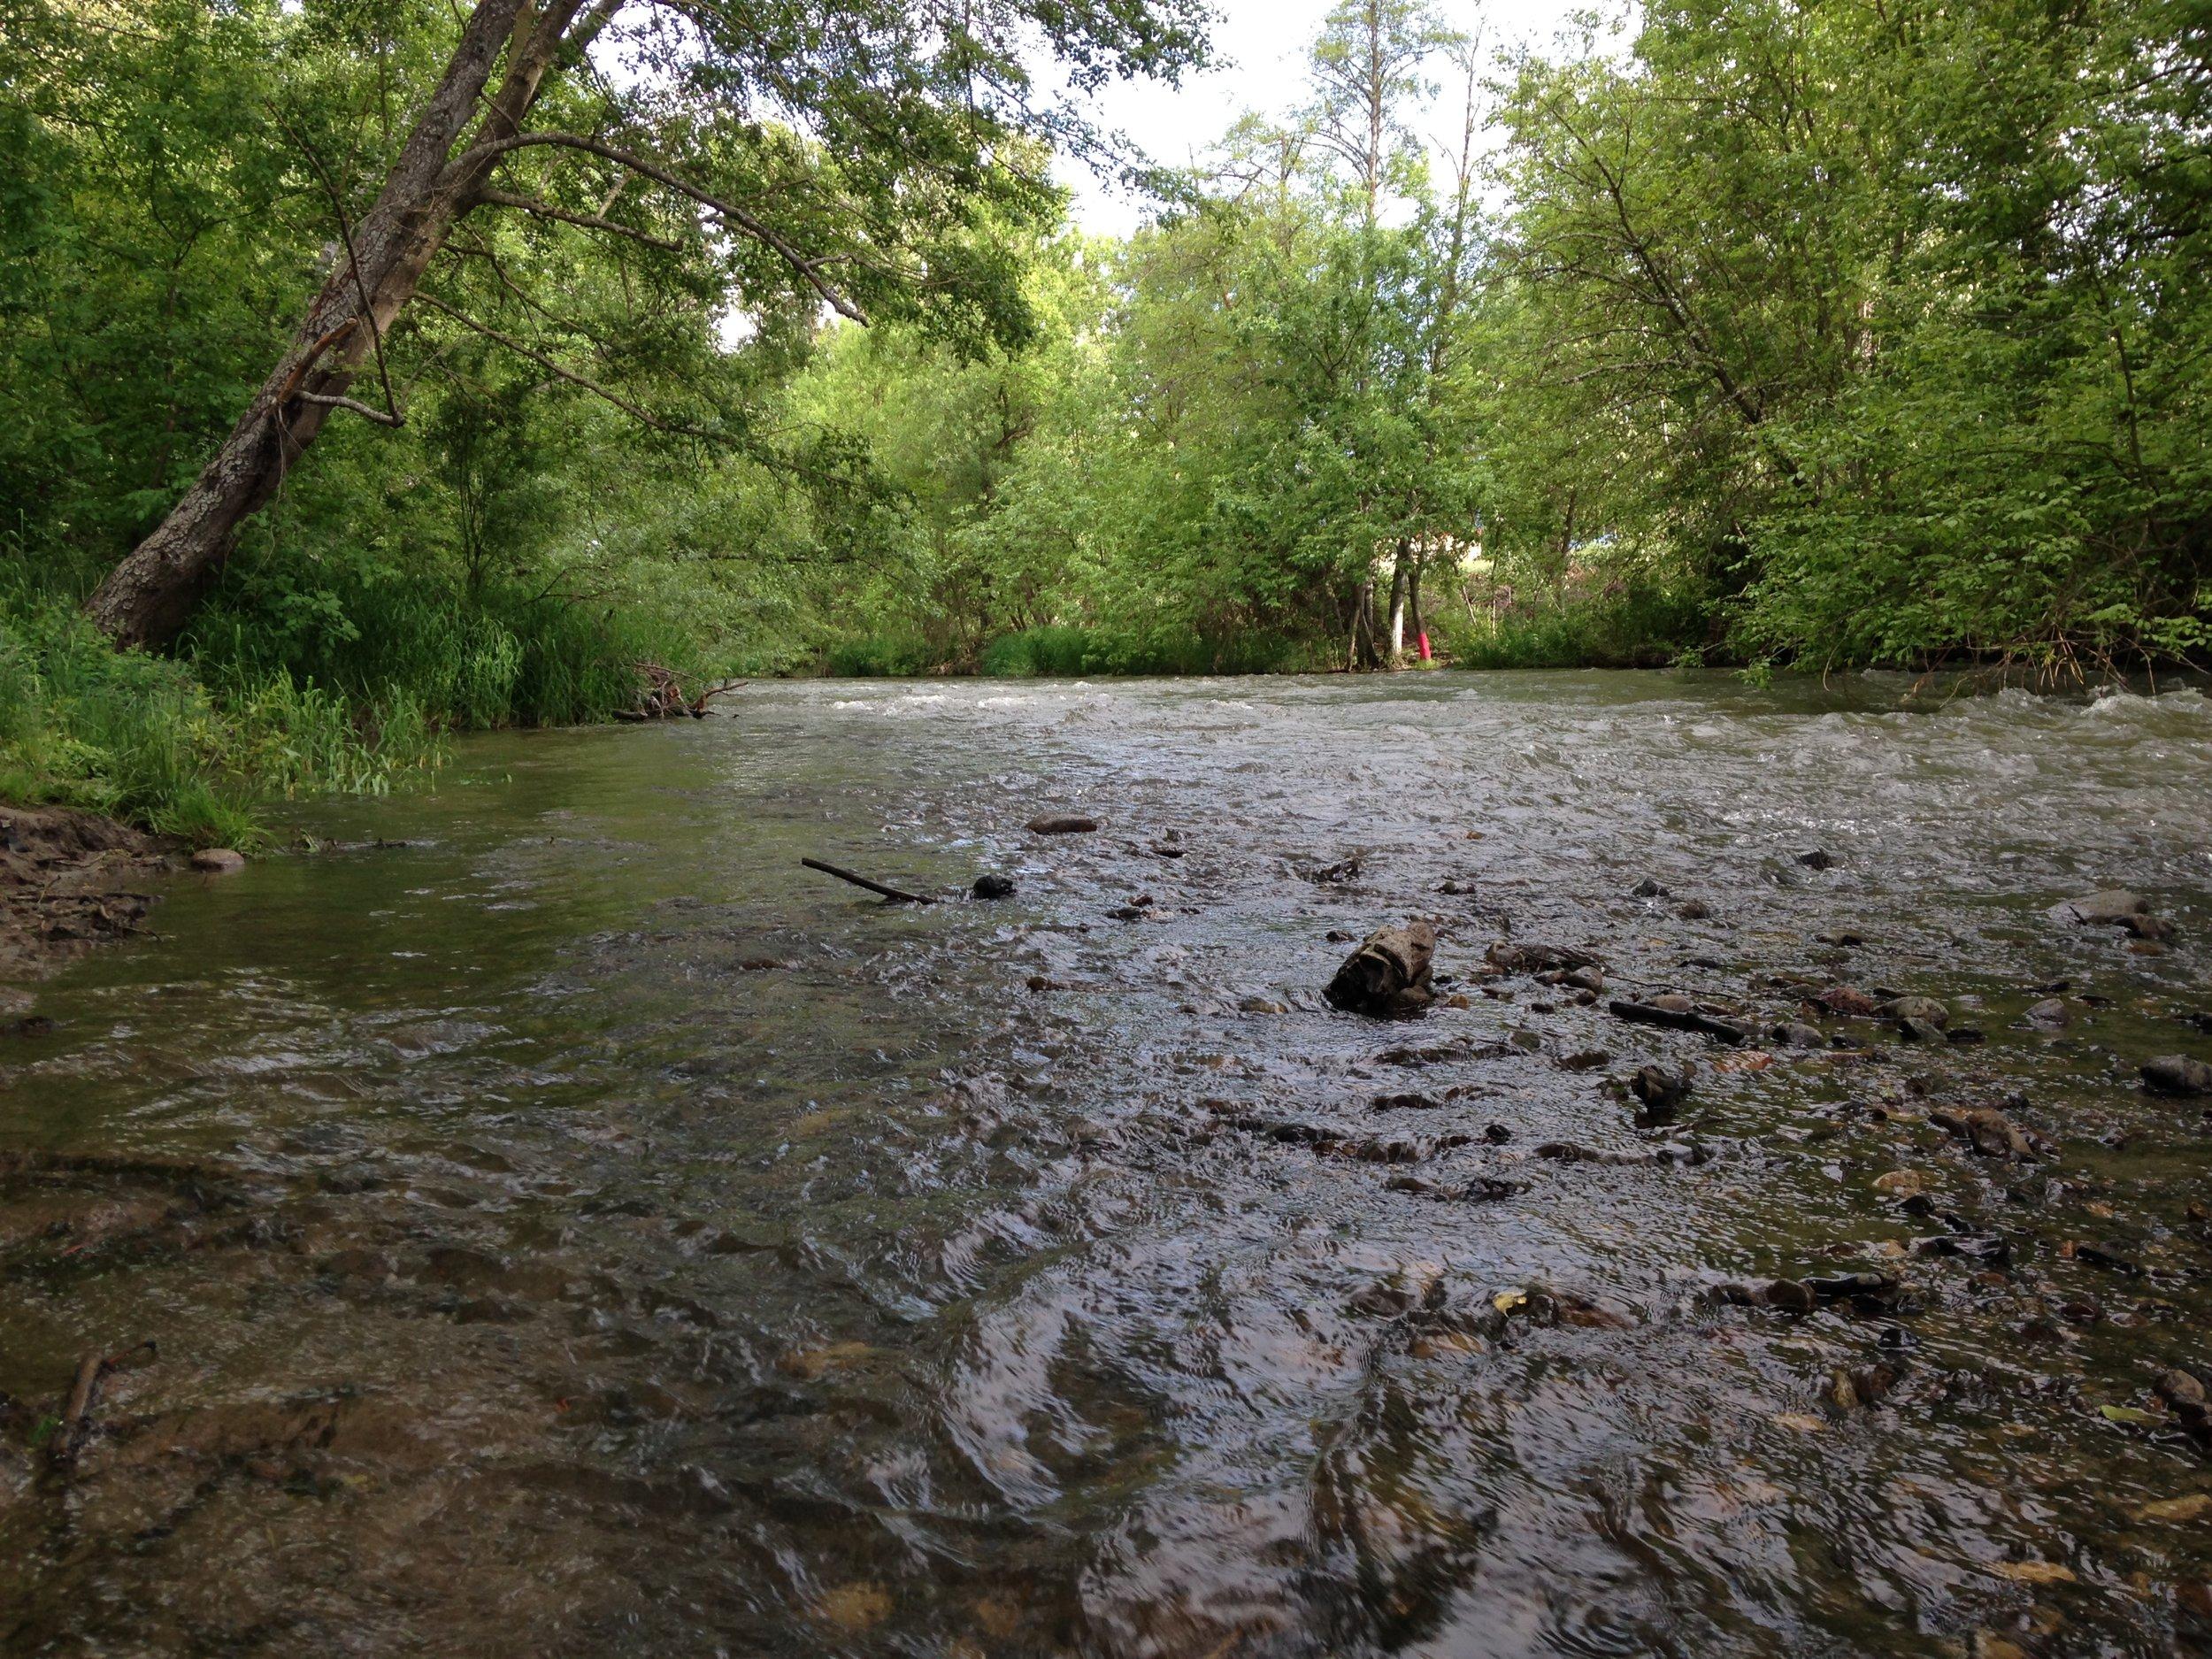 Bear Creek, Upton Rd. Bridge, Central Point